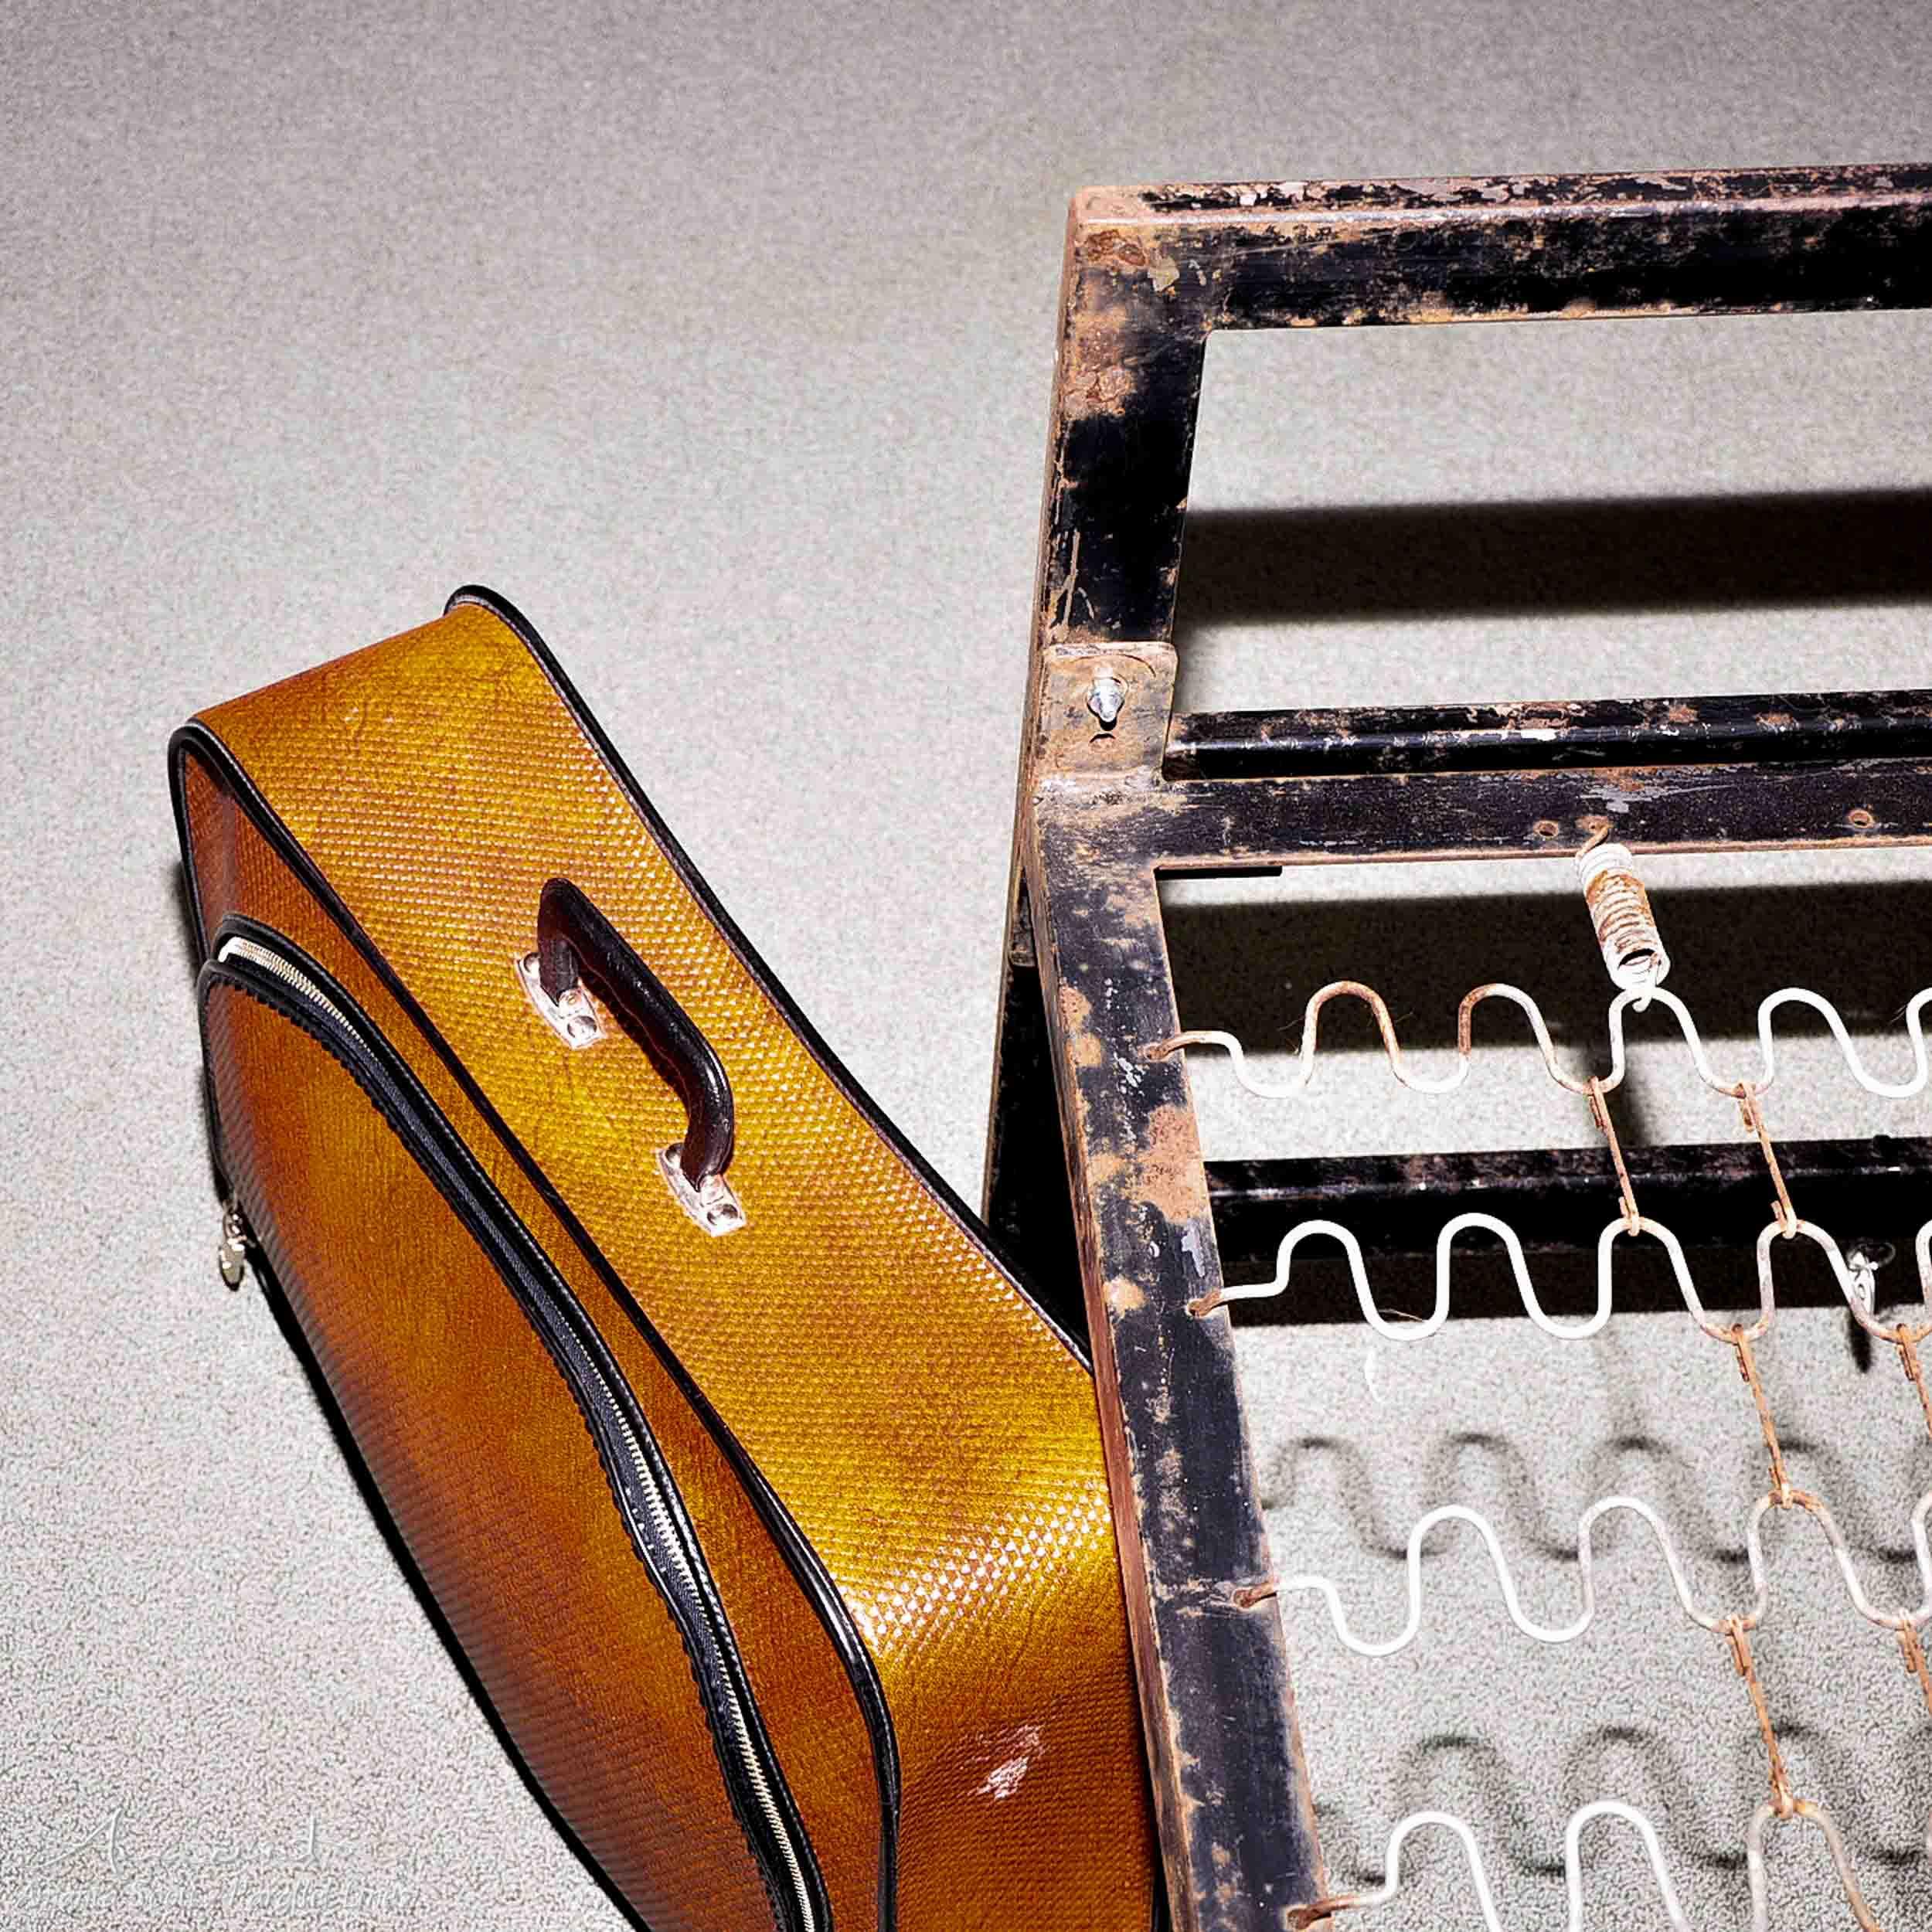 prisonbed-suitcase-6615.jpg